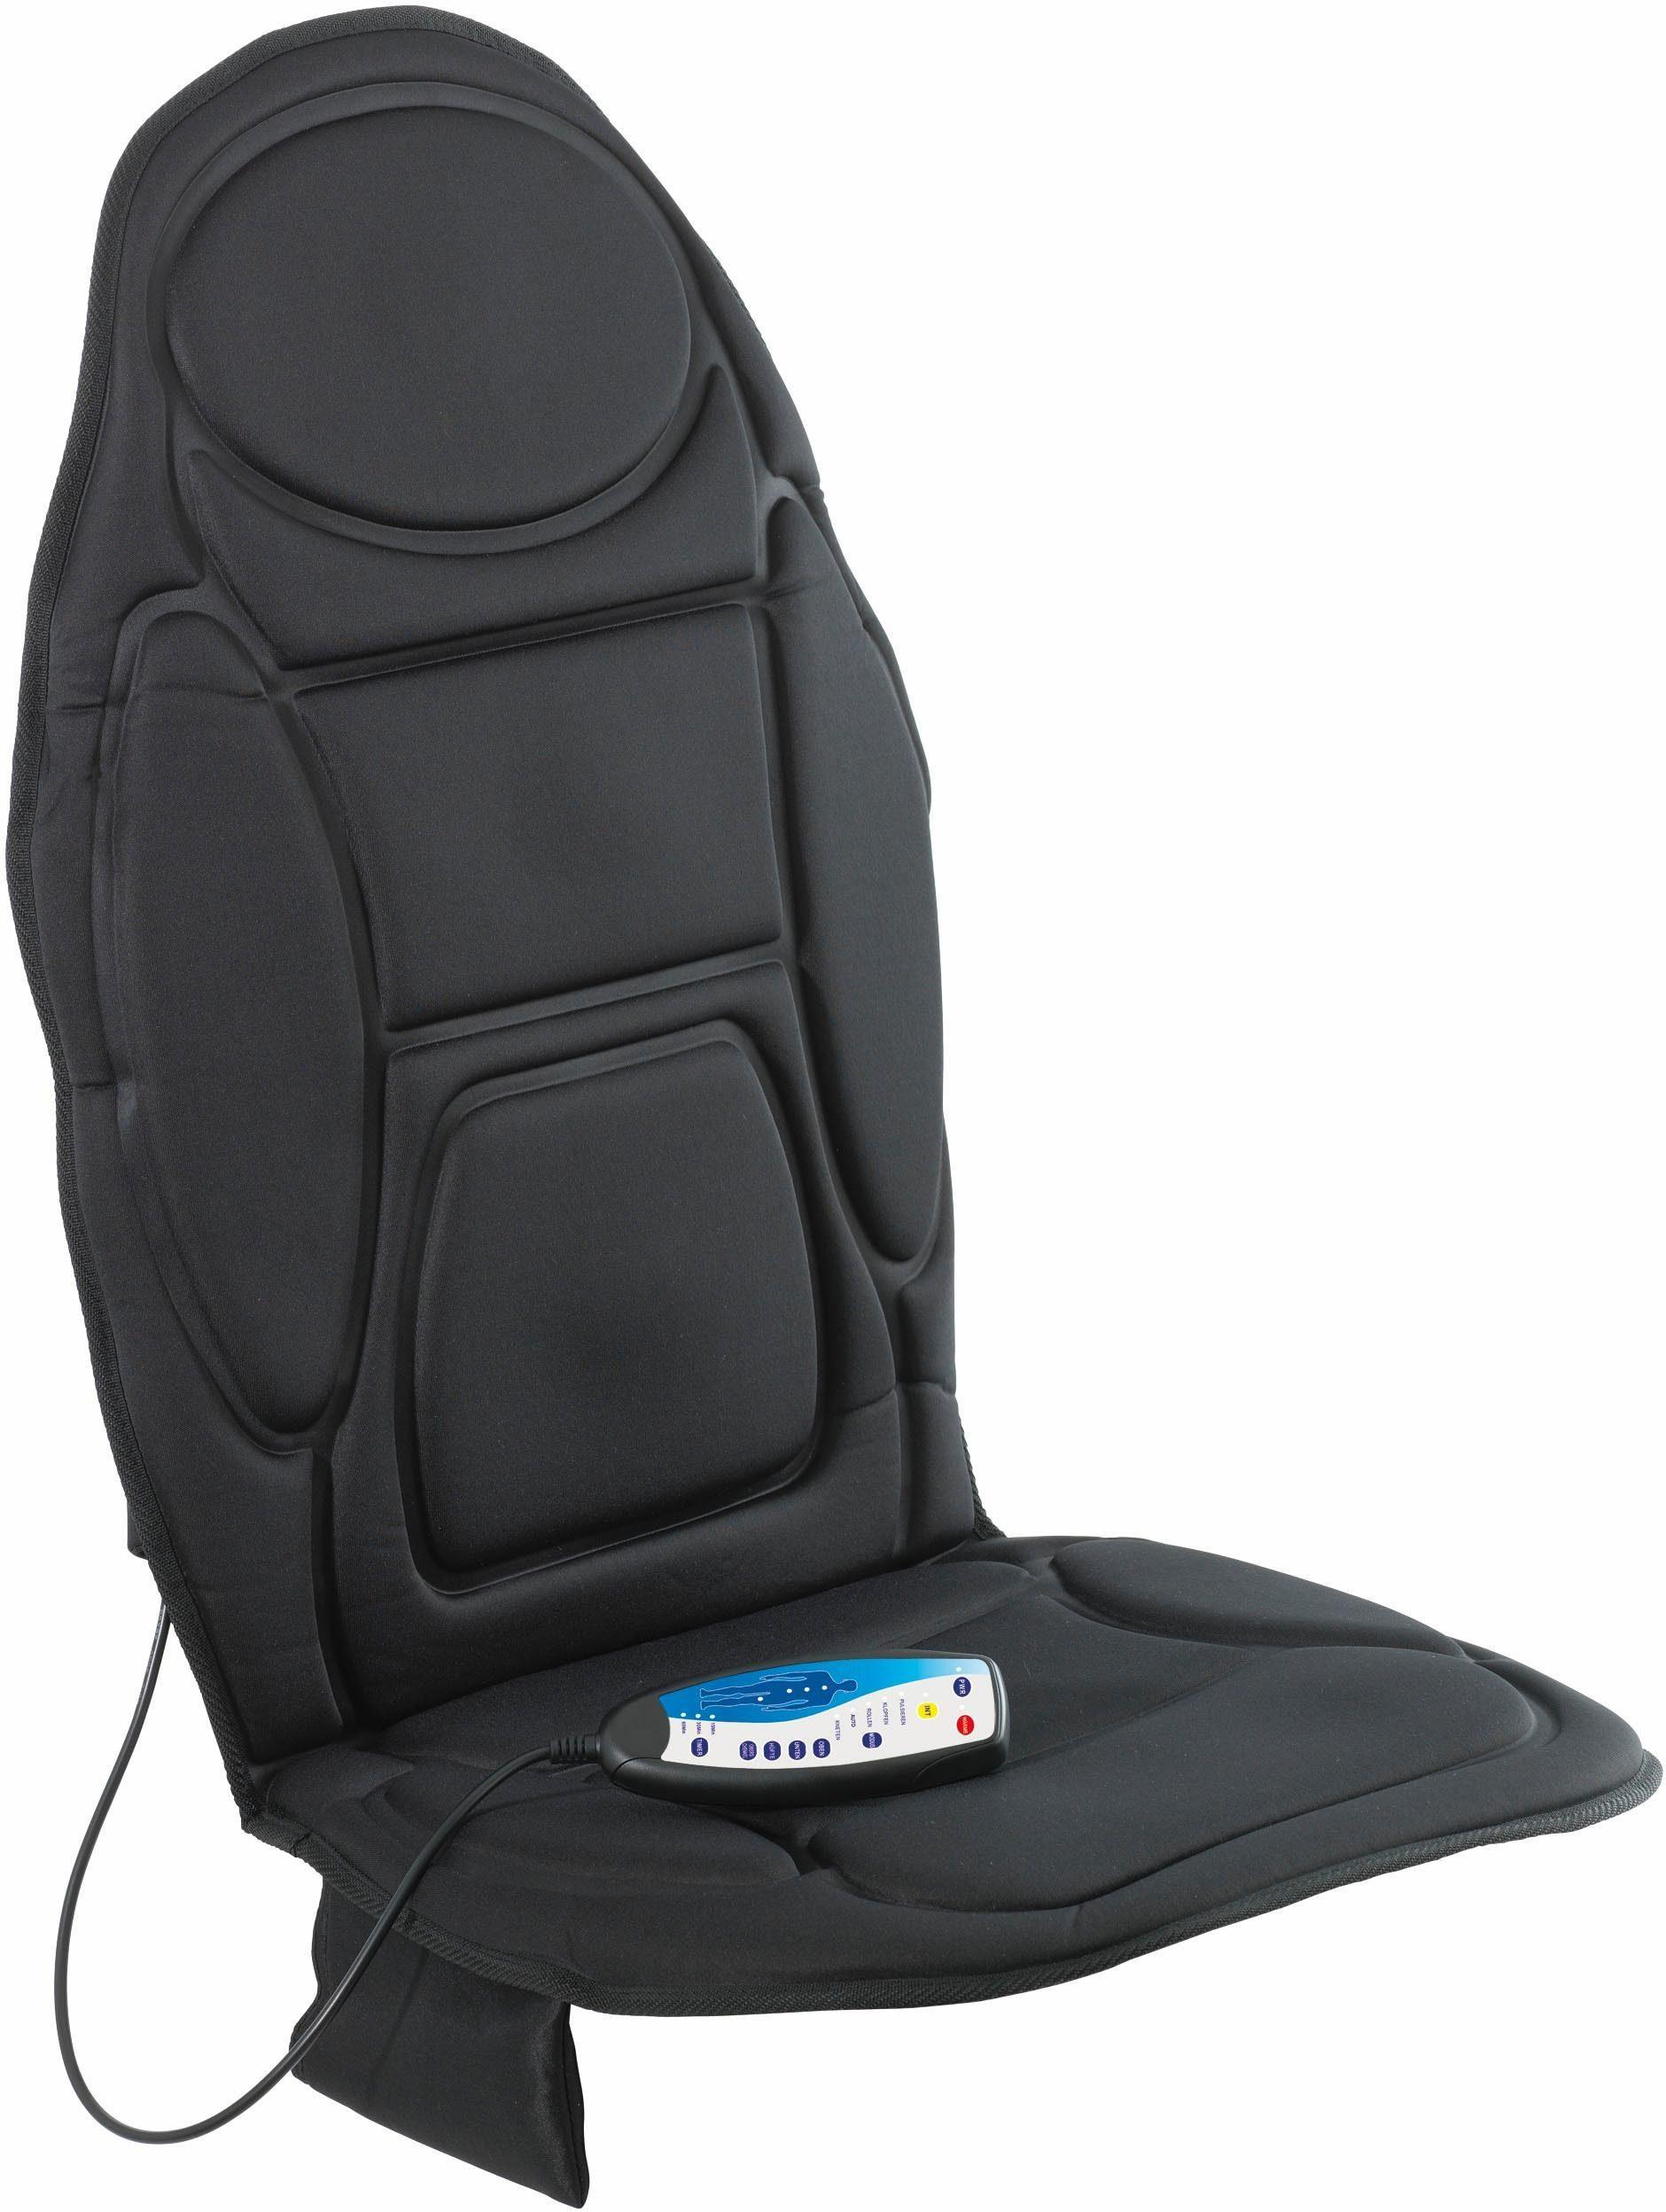 Vitalmaxx Massagematte 5-Zonen Sessel oder Stuhl 12V, mit Wärmefunktion + Autoadapter